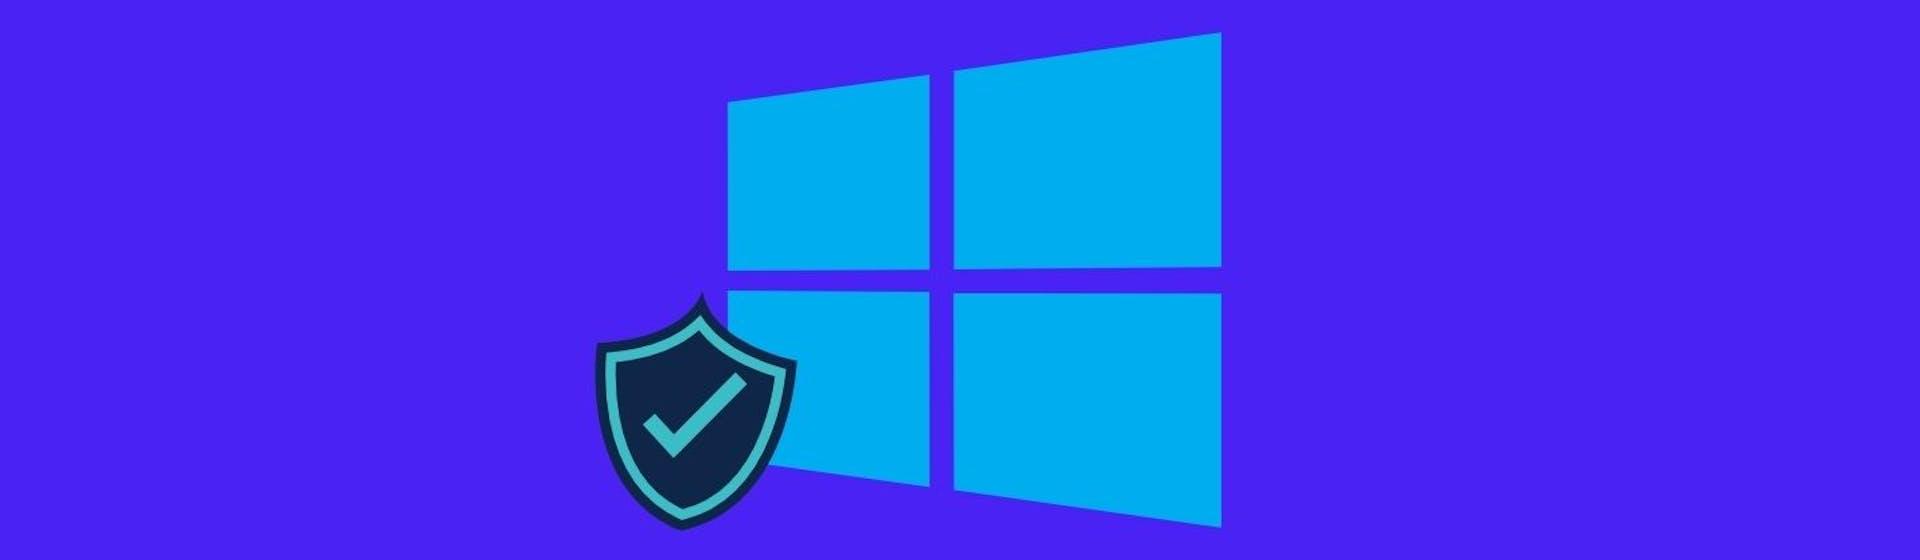 Modo a prueba de fallos Windows 10: inicia en modo seguro fácilmente